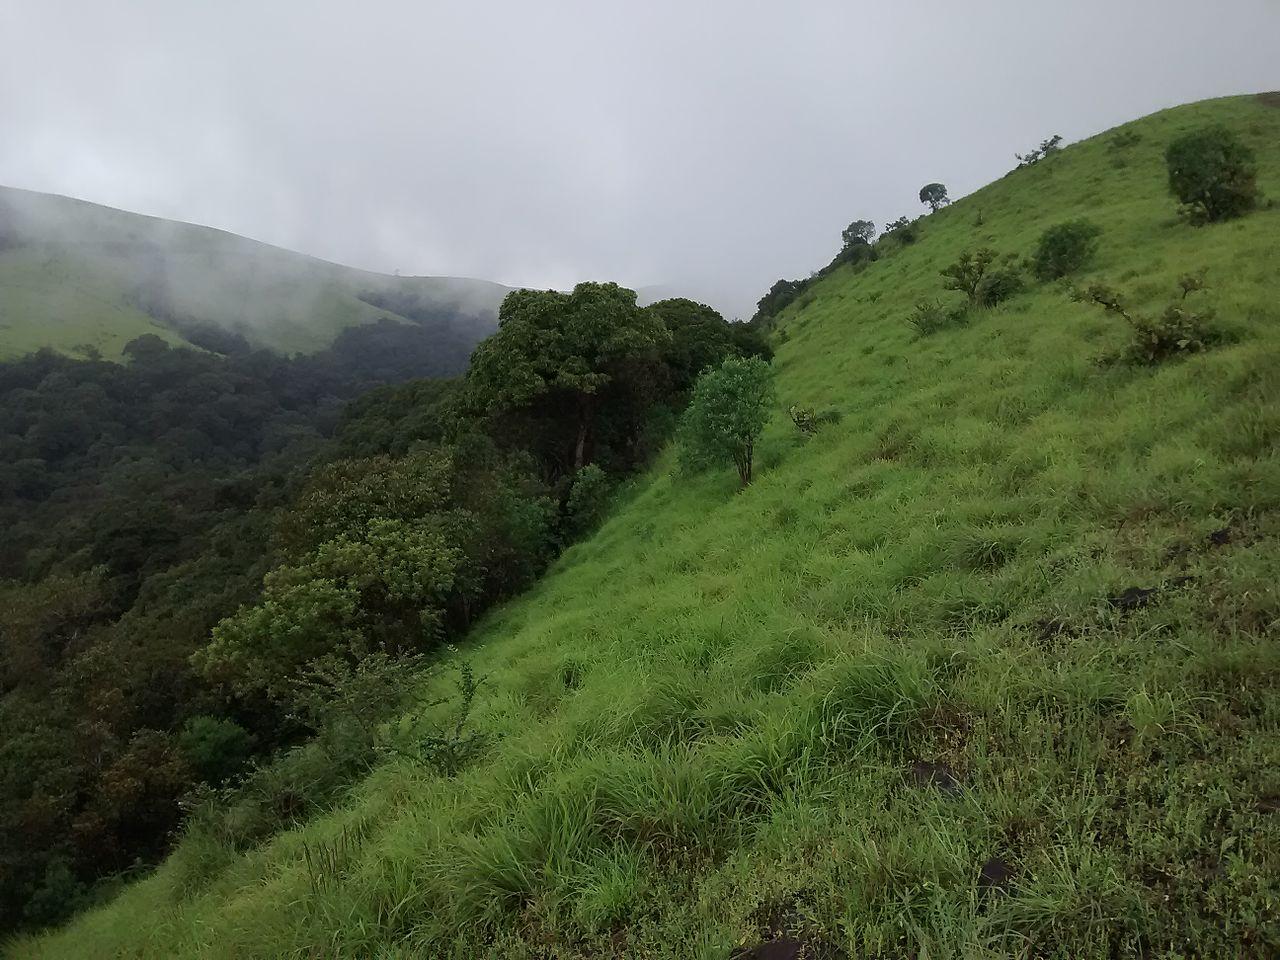 Amazing Place to Visit Nearby Maravanthe Beach-Kodachadri Hills